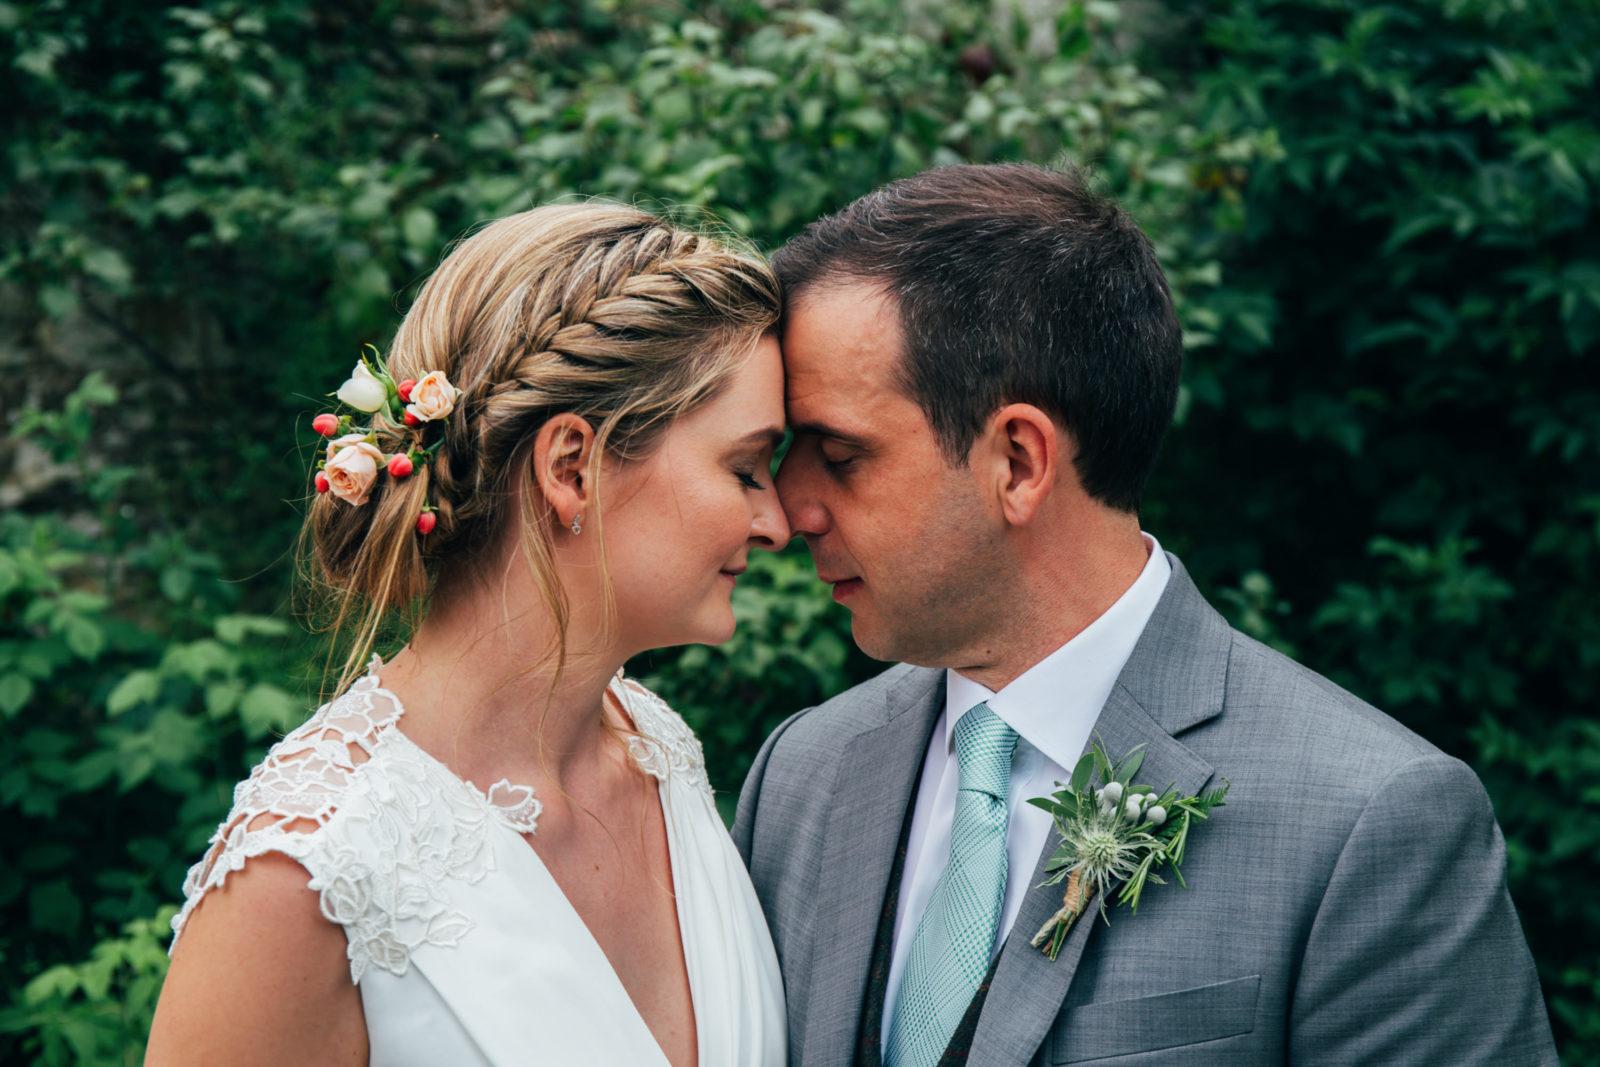 bride and groom portrait at unique suffolk wedding venue wilderness